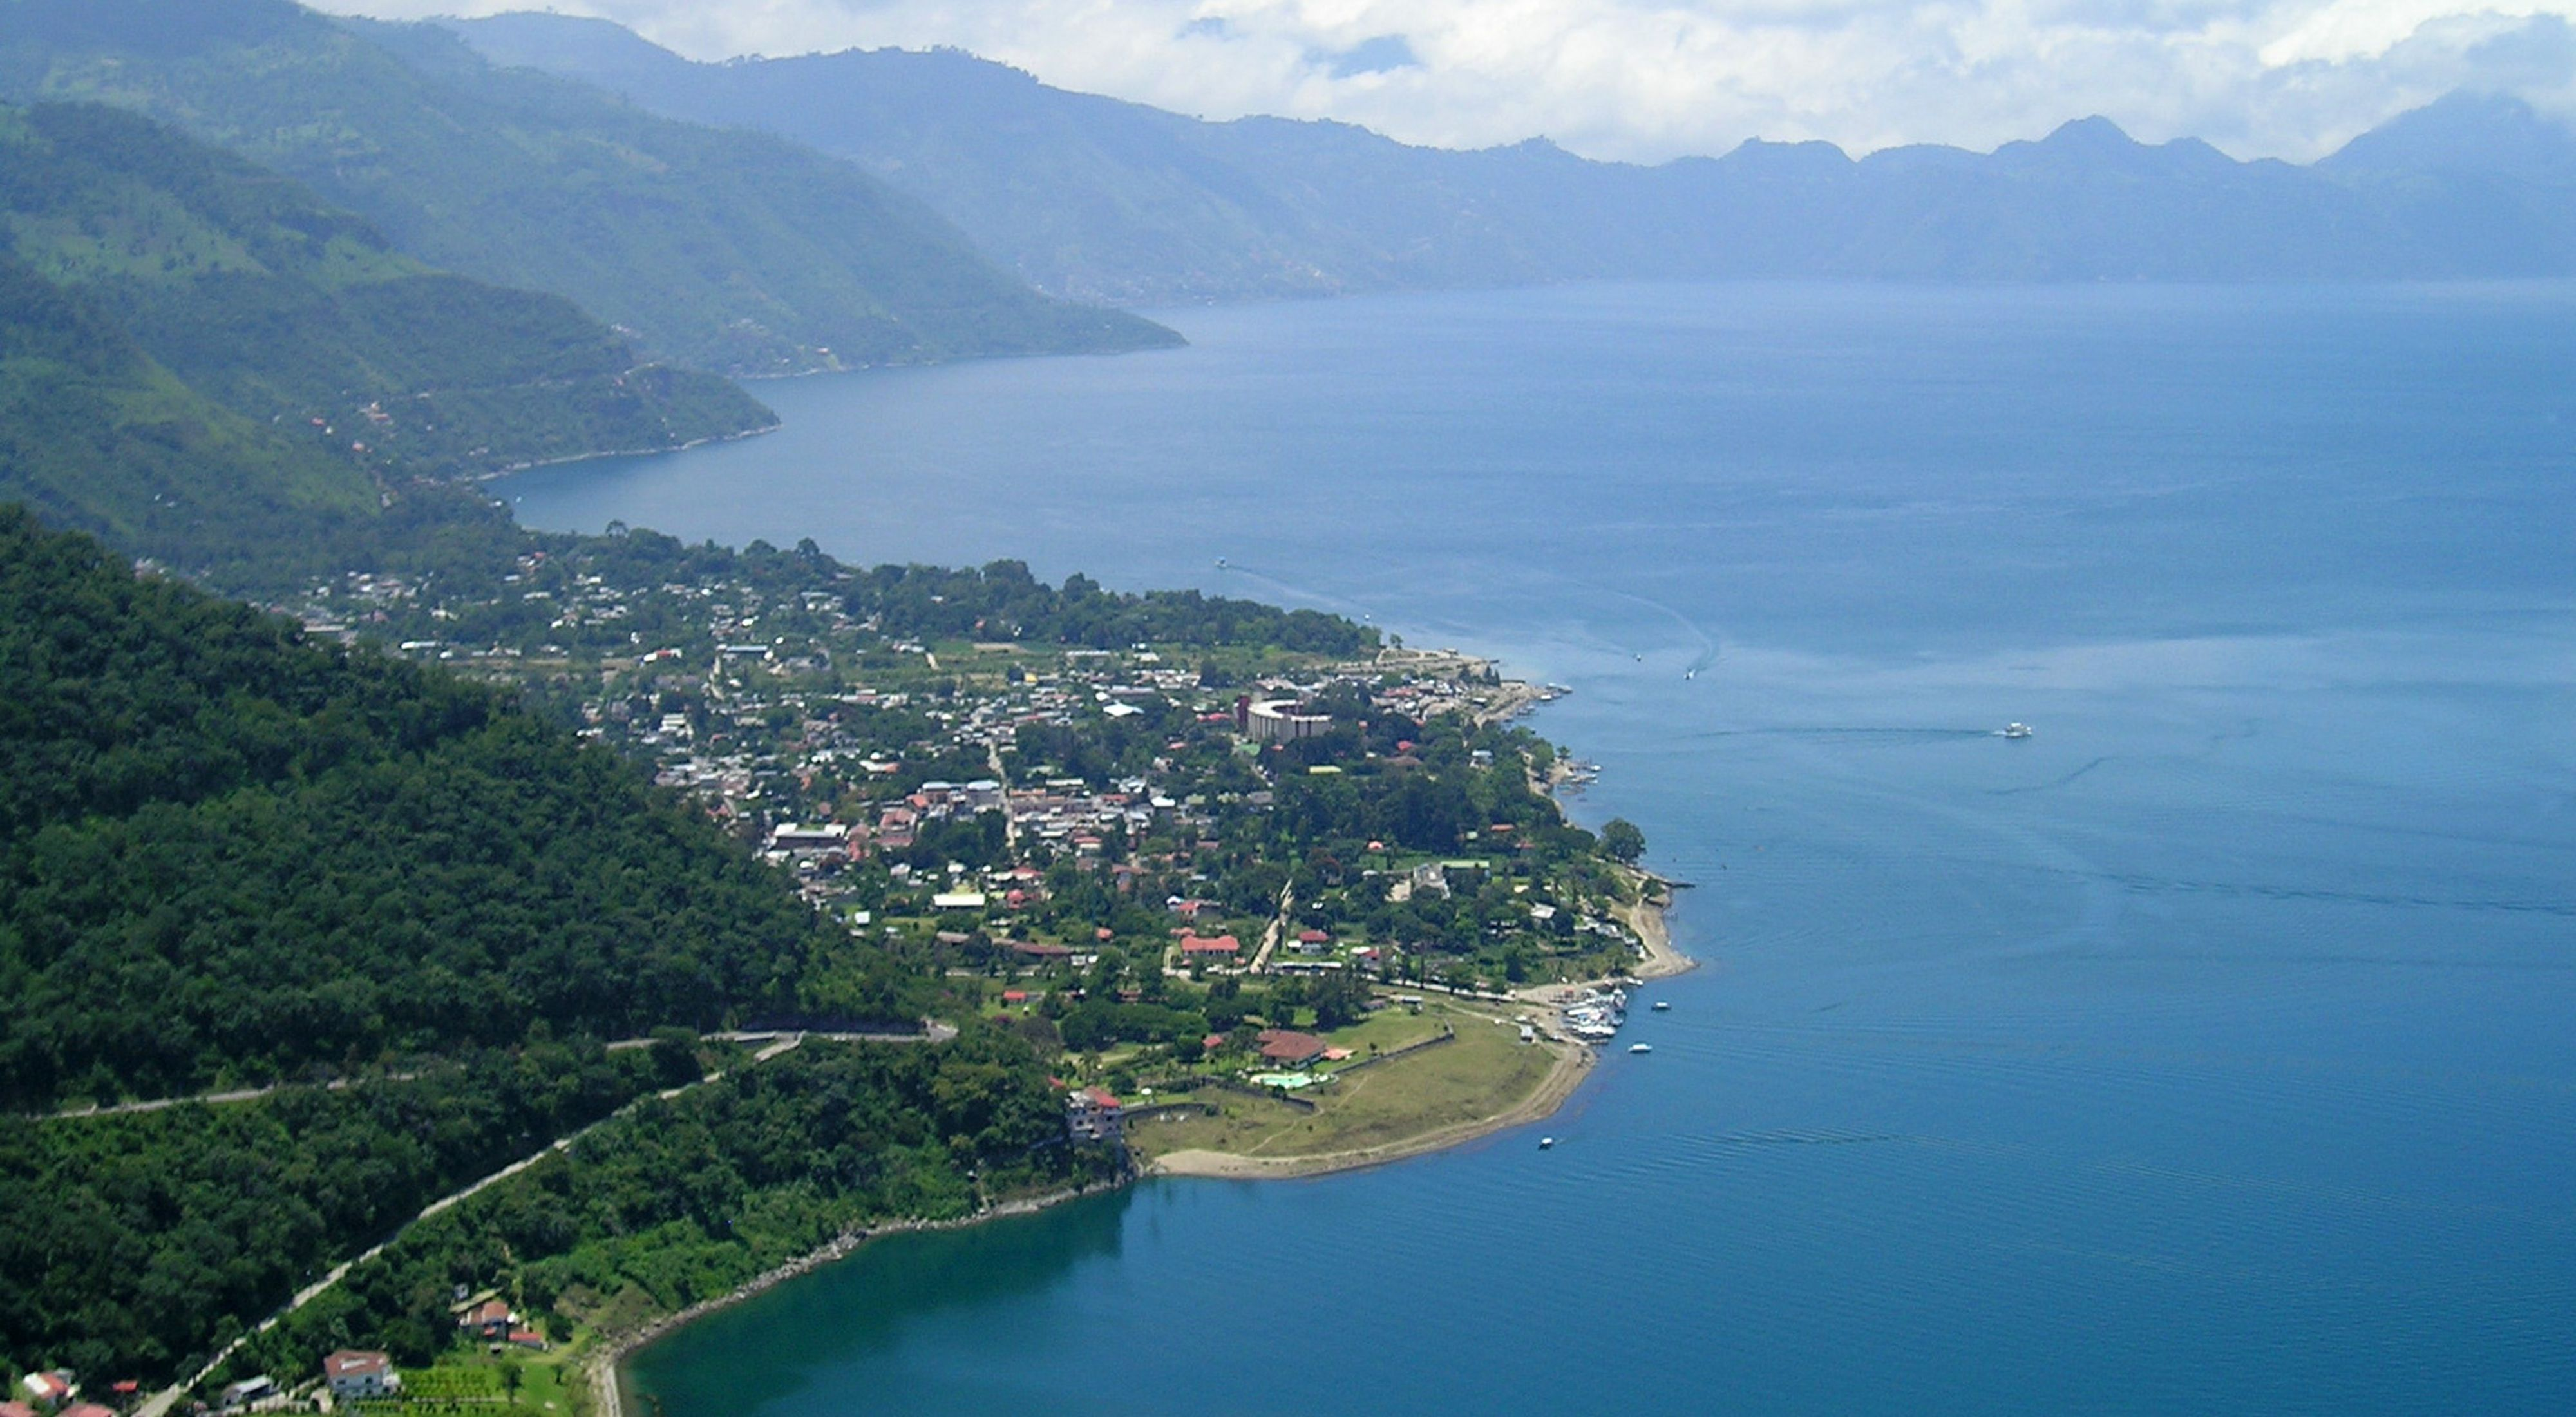 Vista aérea de la costa de Guatemala